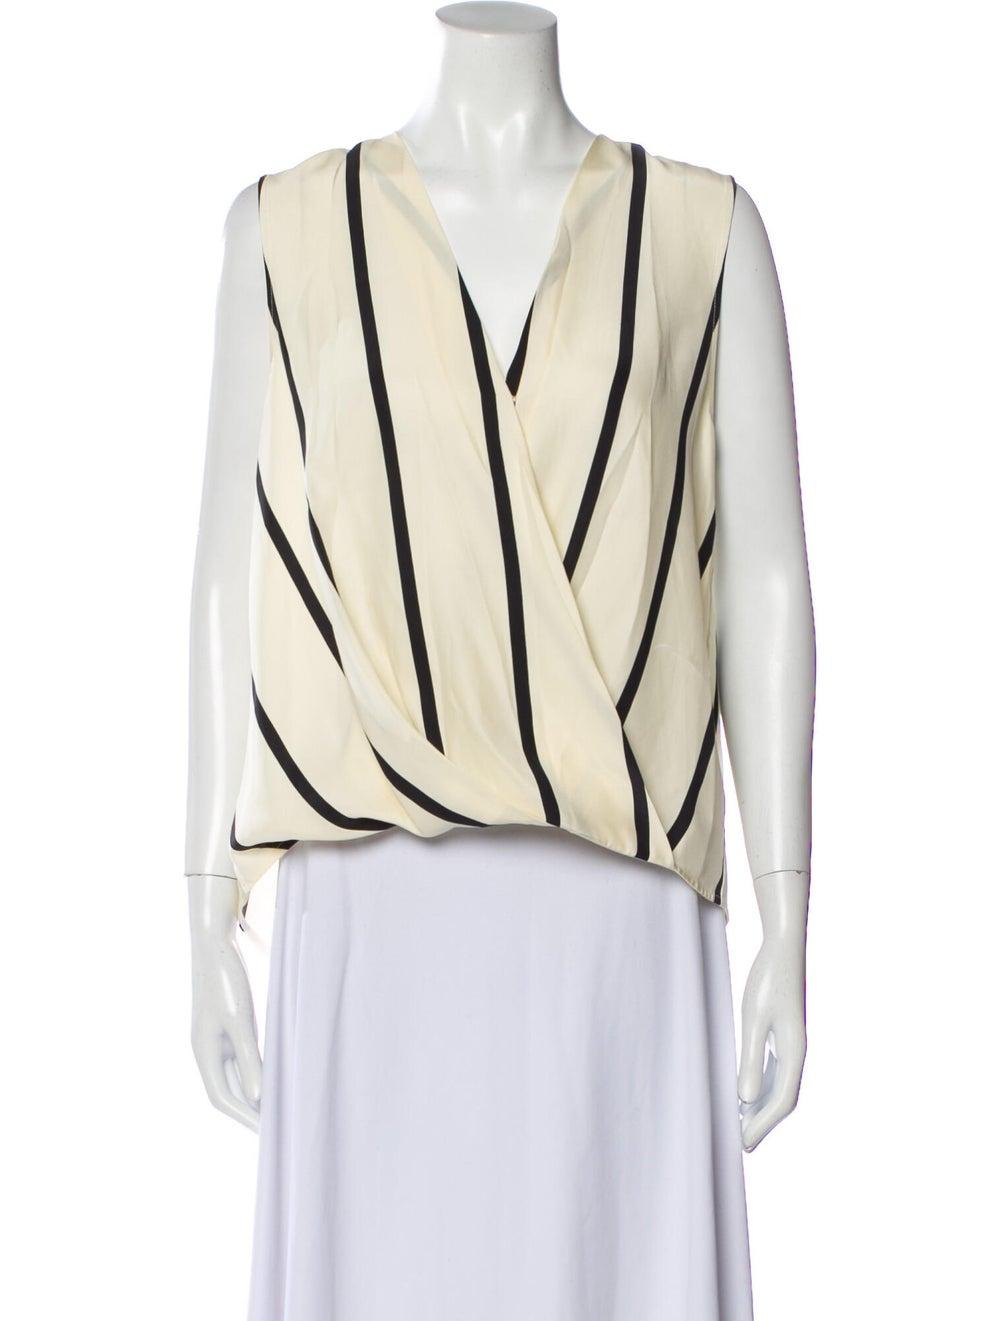 Rag & Bone Silk Striped Blouse - image 1